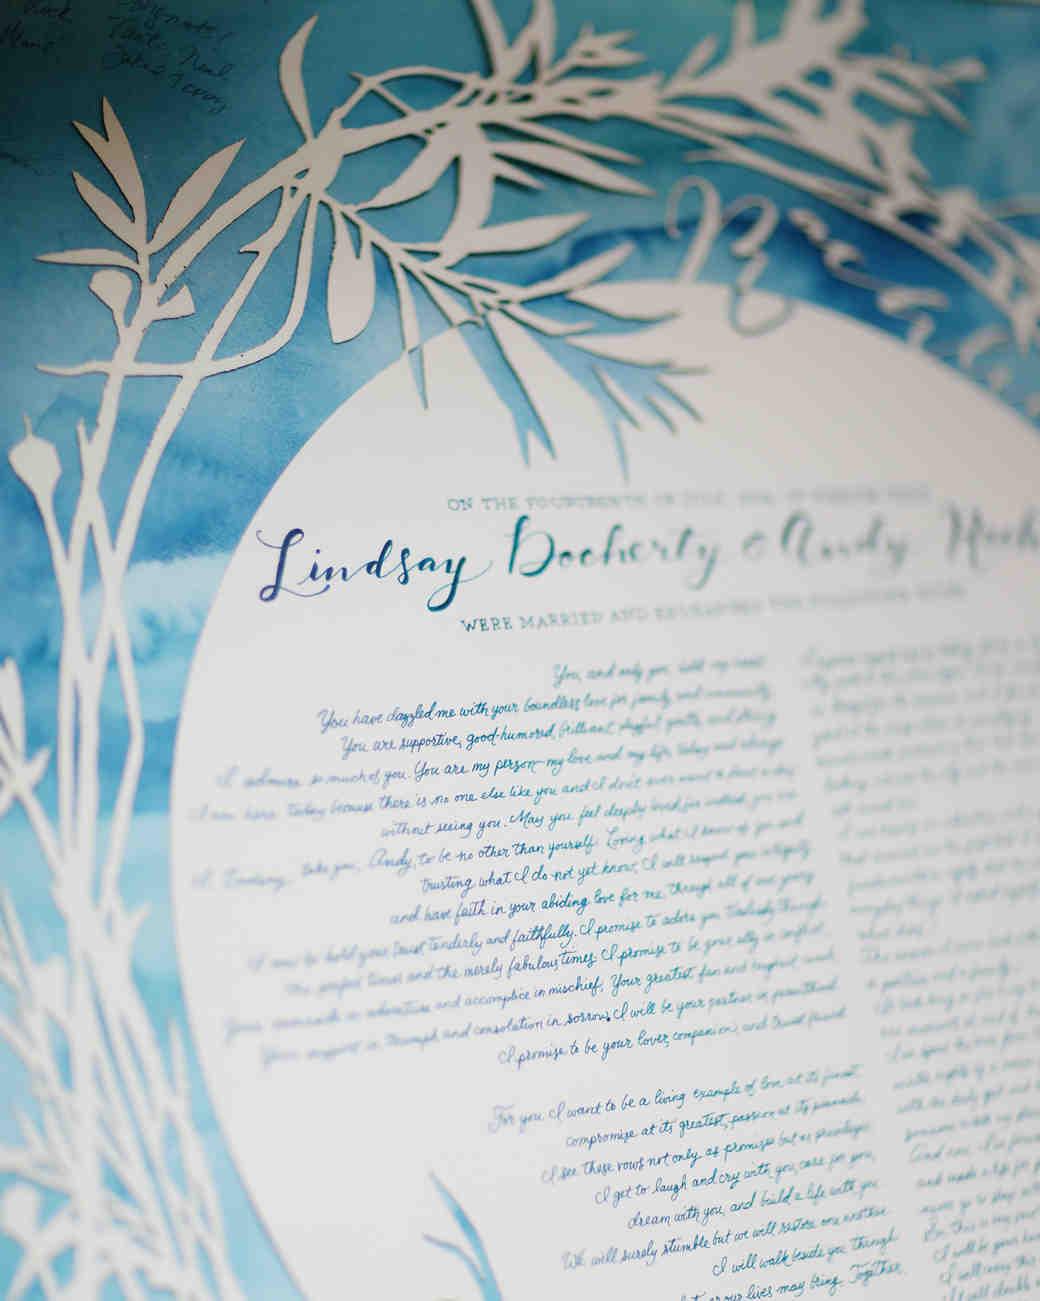 lindsay-andy-wedding-ketubah-8269-s111659-1114.jpg